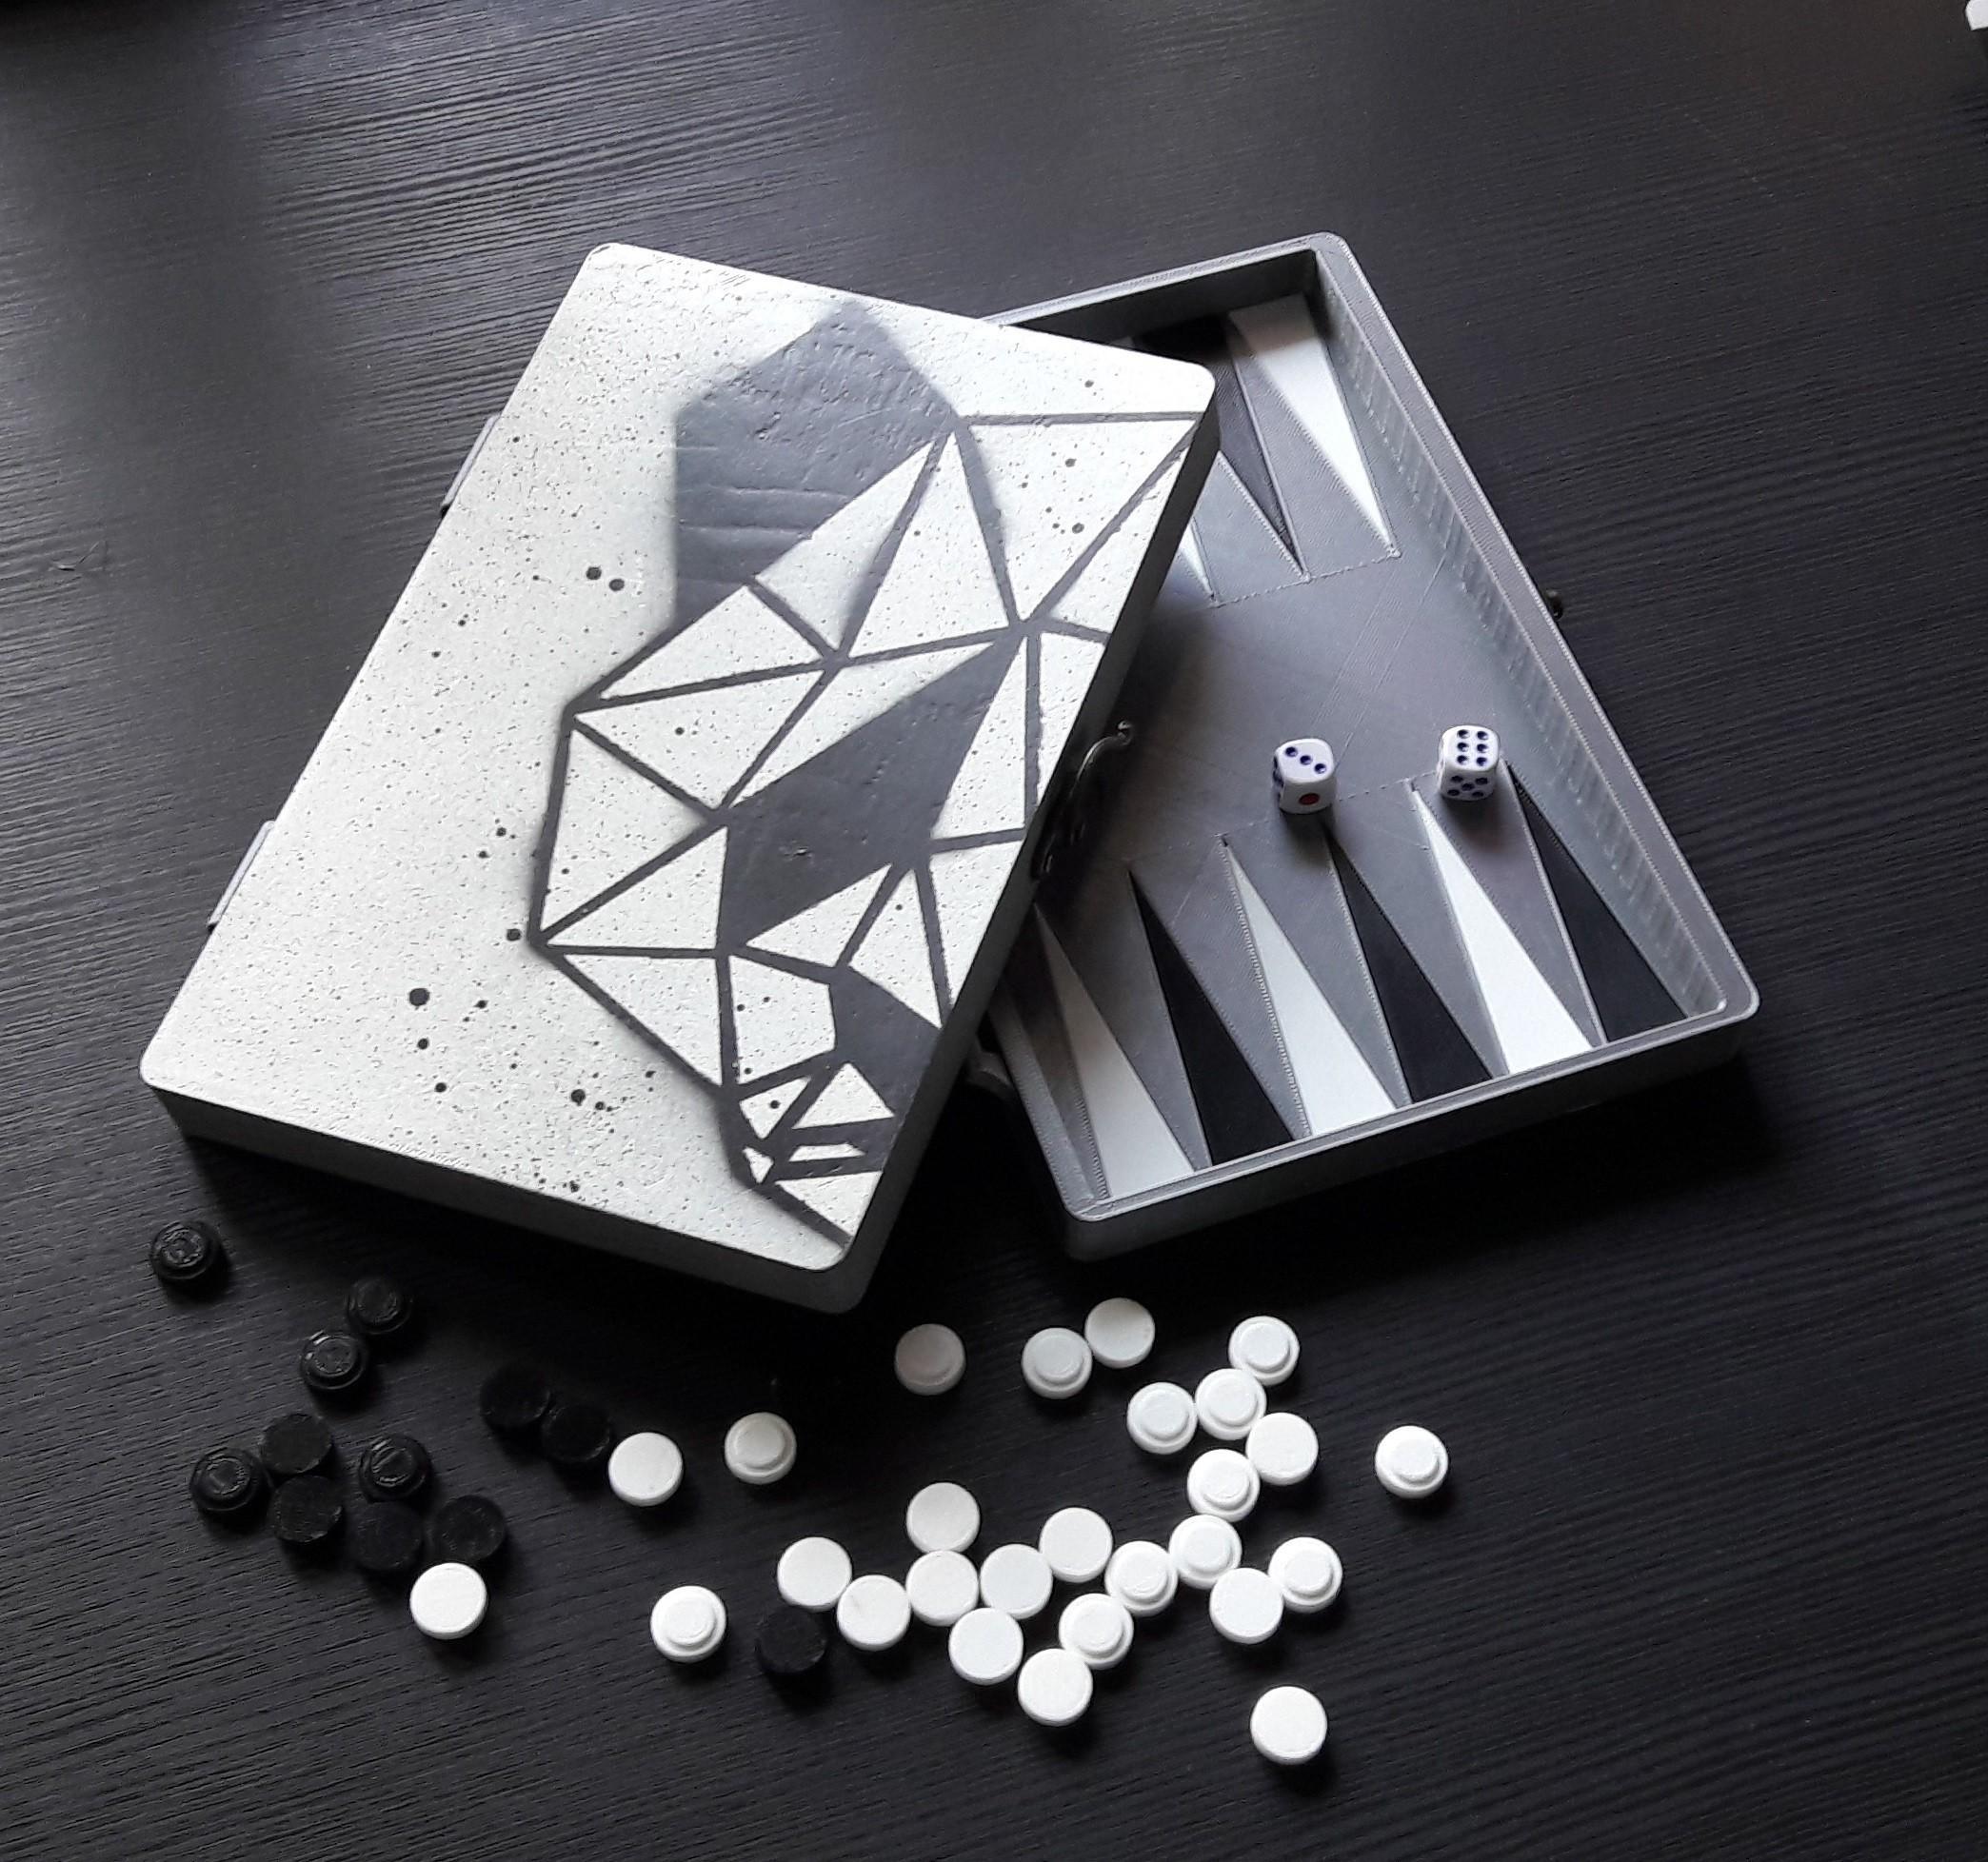 20170907_081842.jpg Download STL file Backgammon game • 3D print template, eliza_sparrow